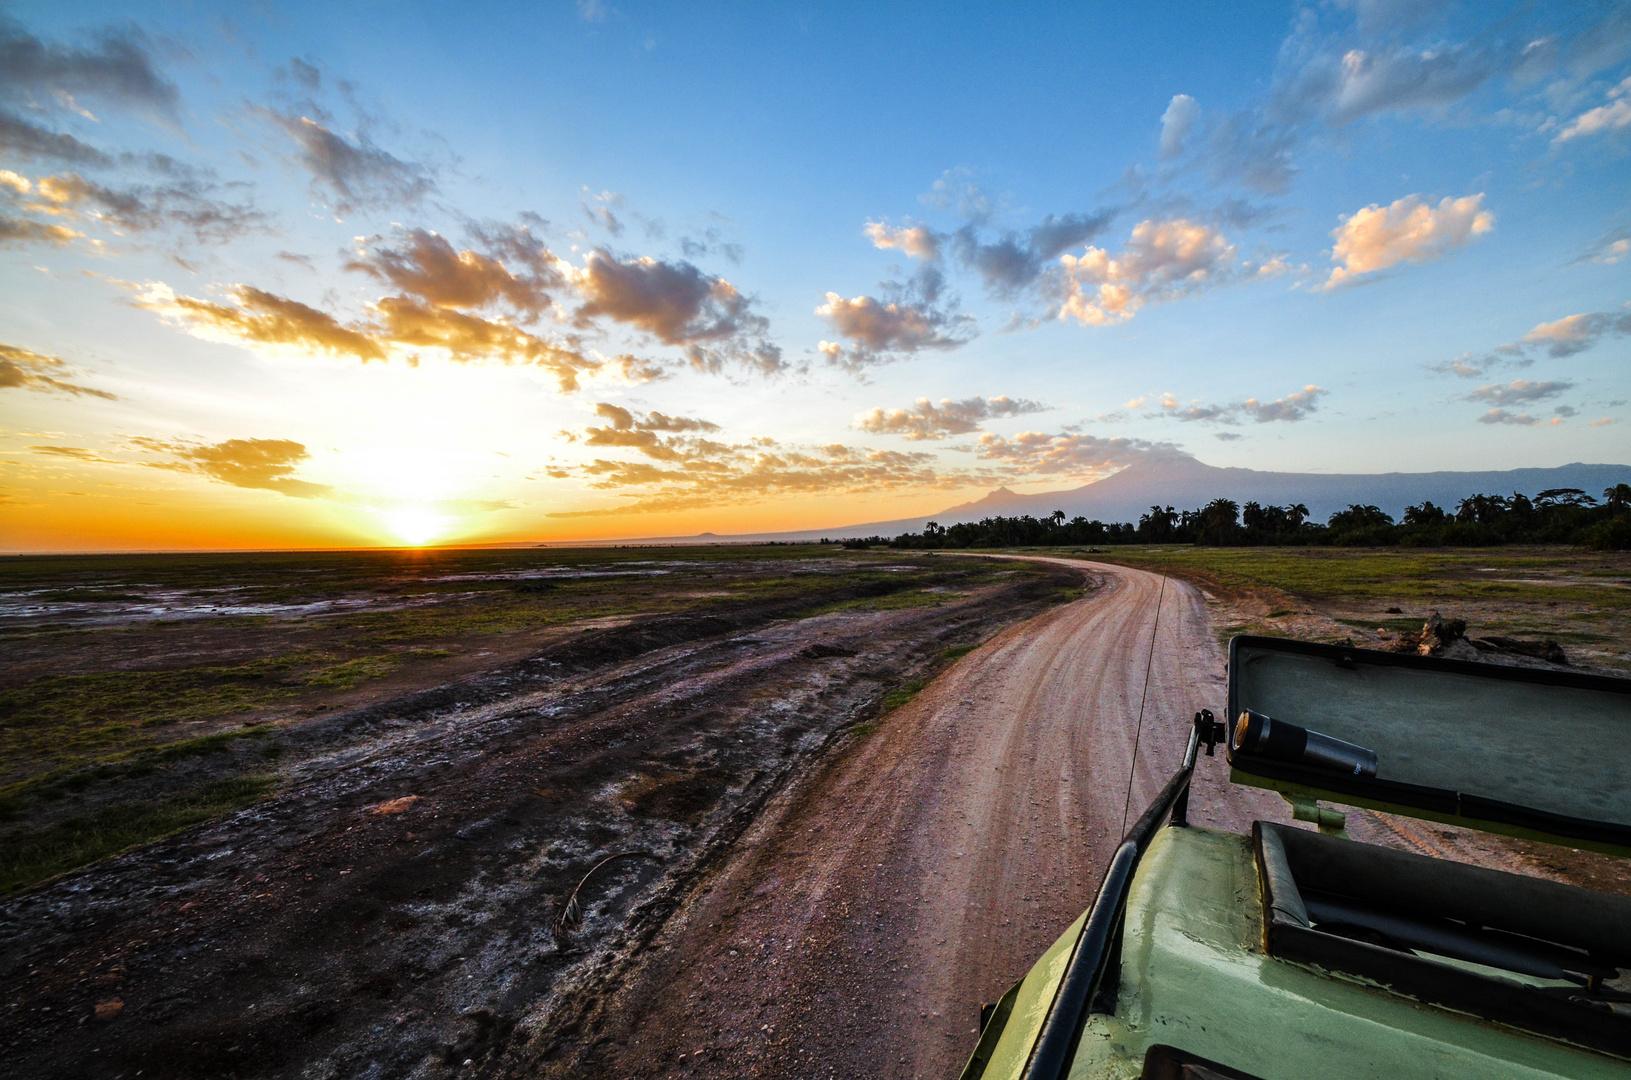 Sonnenaufgang im Amboseli Nationalpark, Kenia